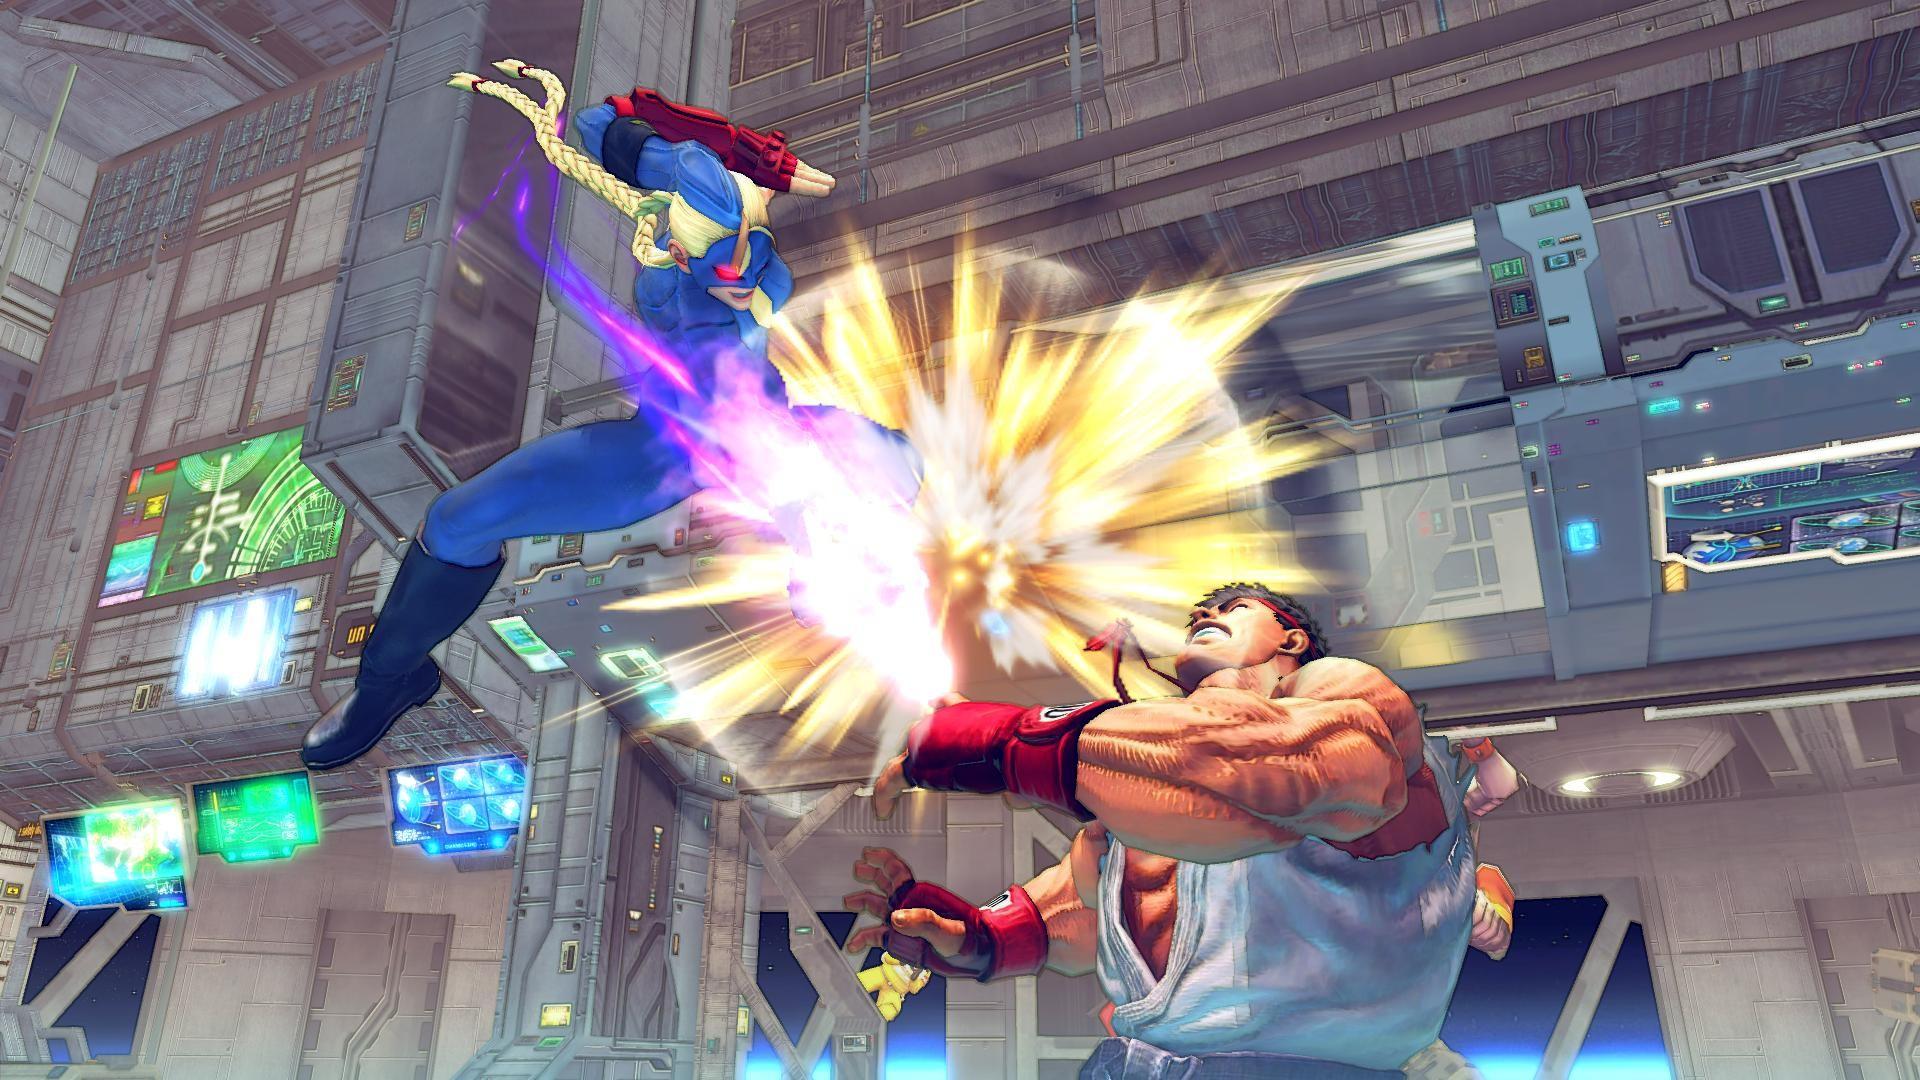 com/games/ultrastreetfighter4